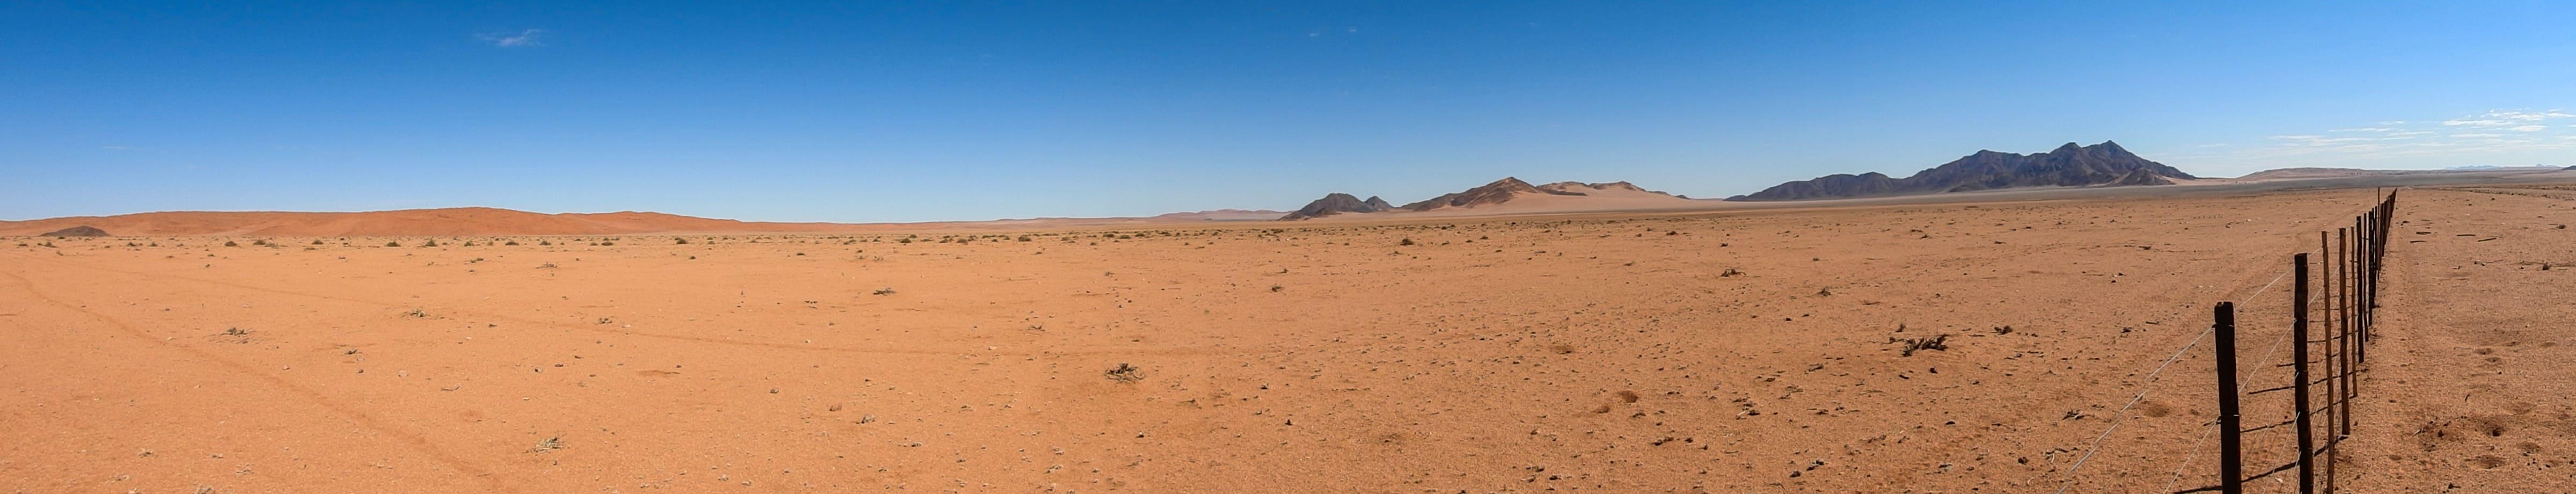 Namibia-D707-03